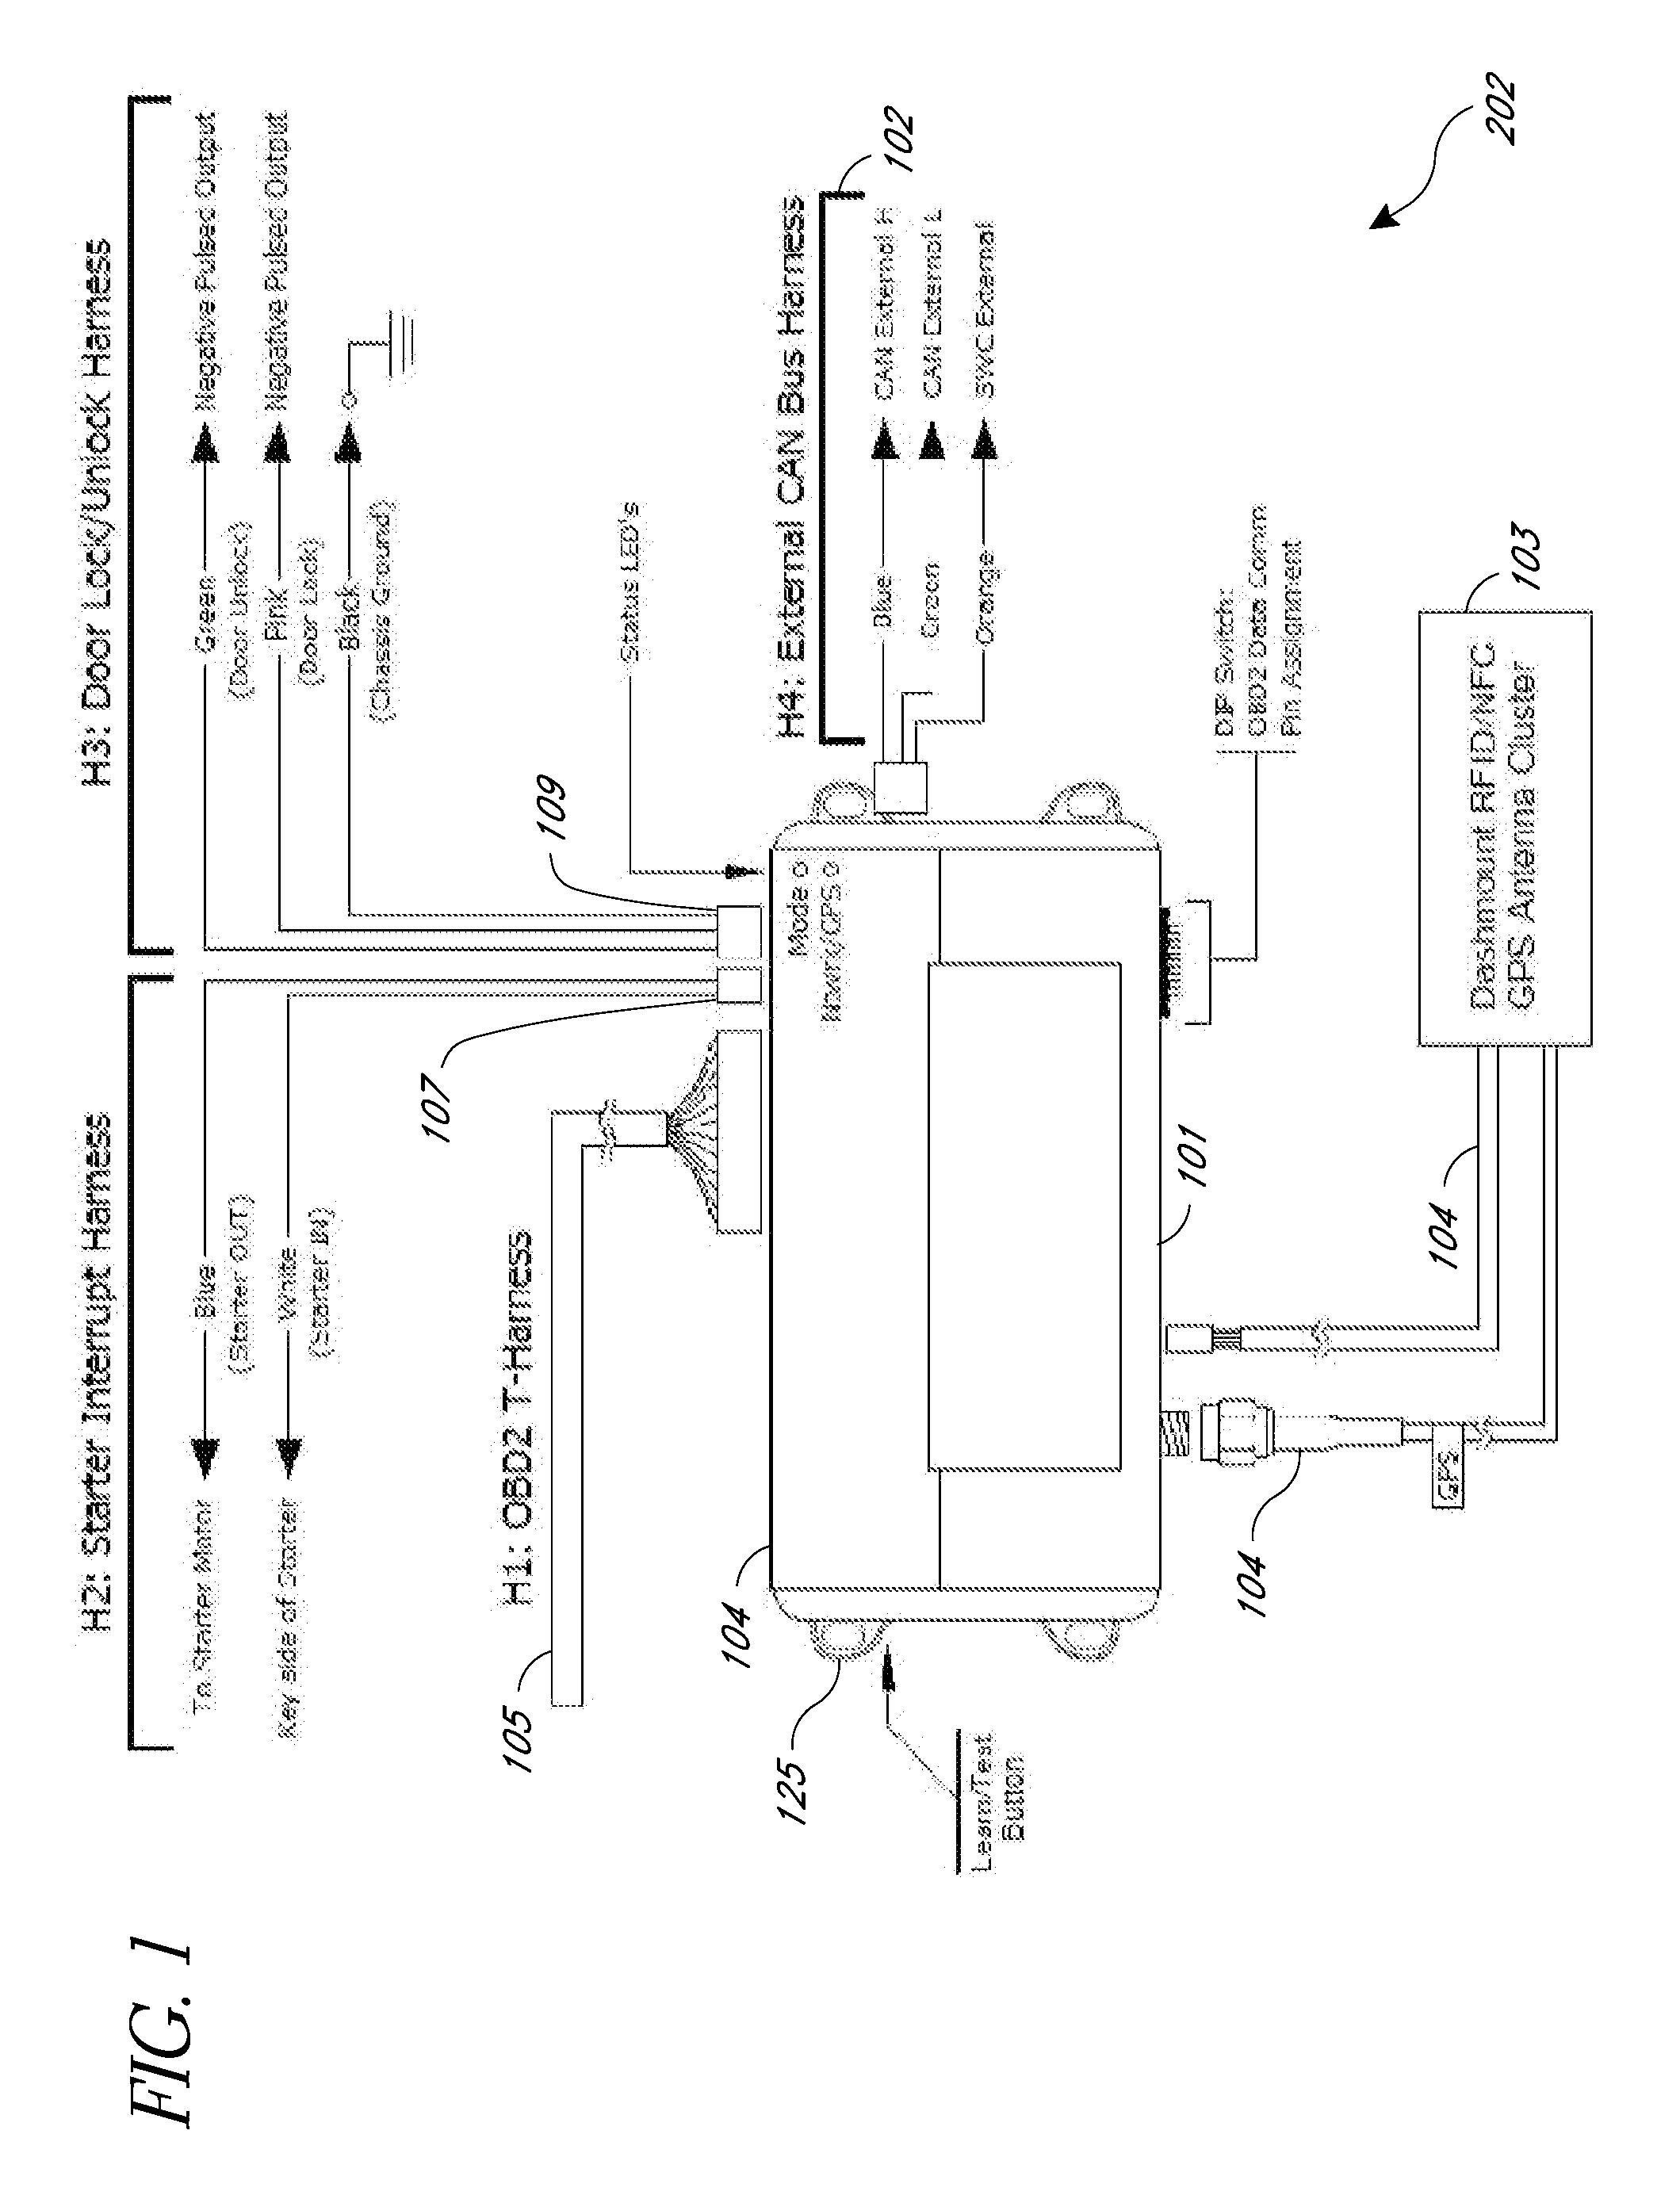 Lowpower Inverter Circuit Diagram Tradeoficcom Trusted Wiring Converter Patent Us 9373201 B2